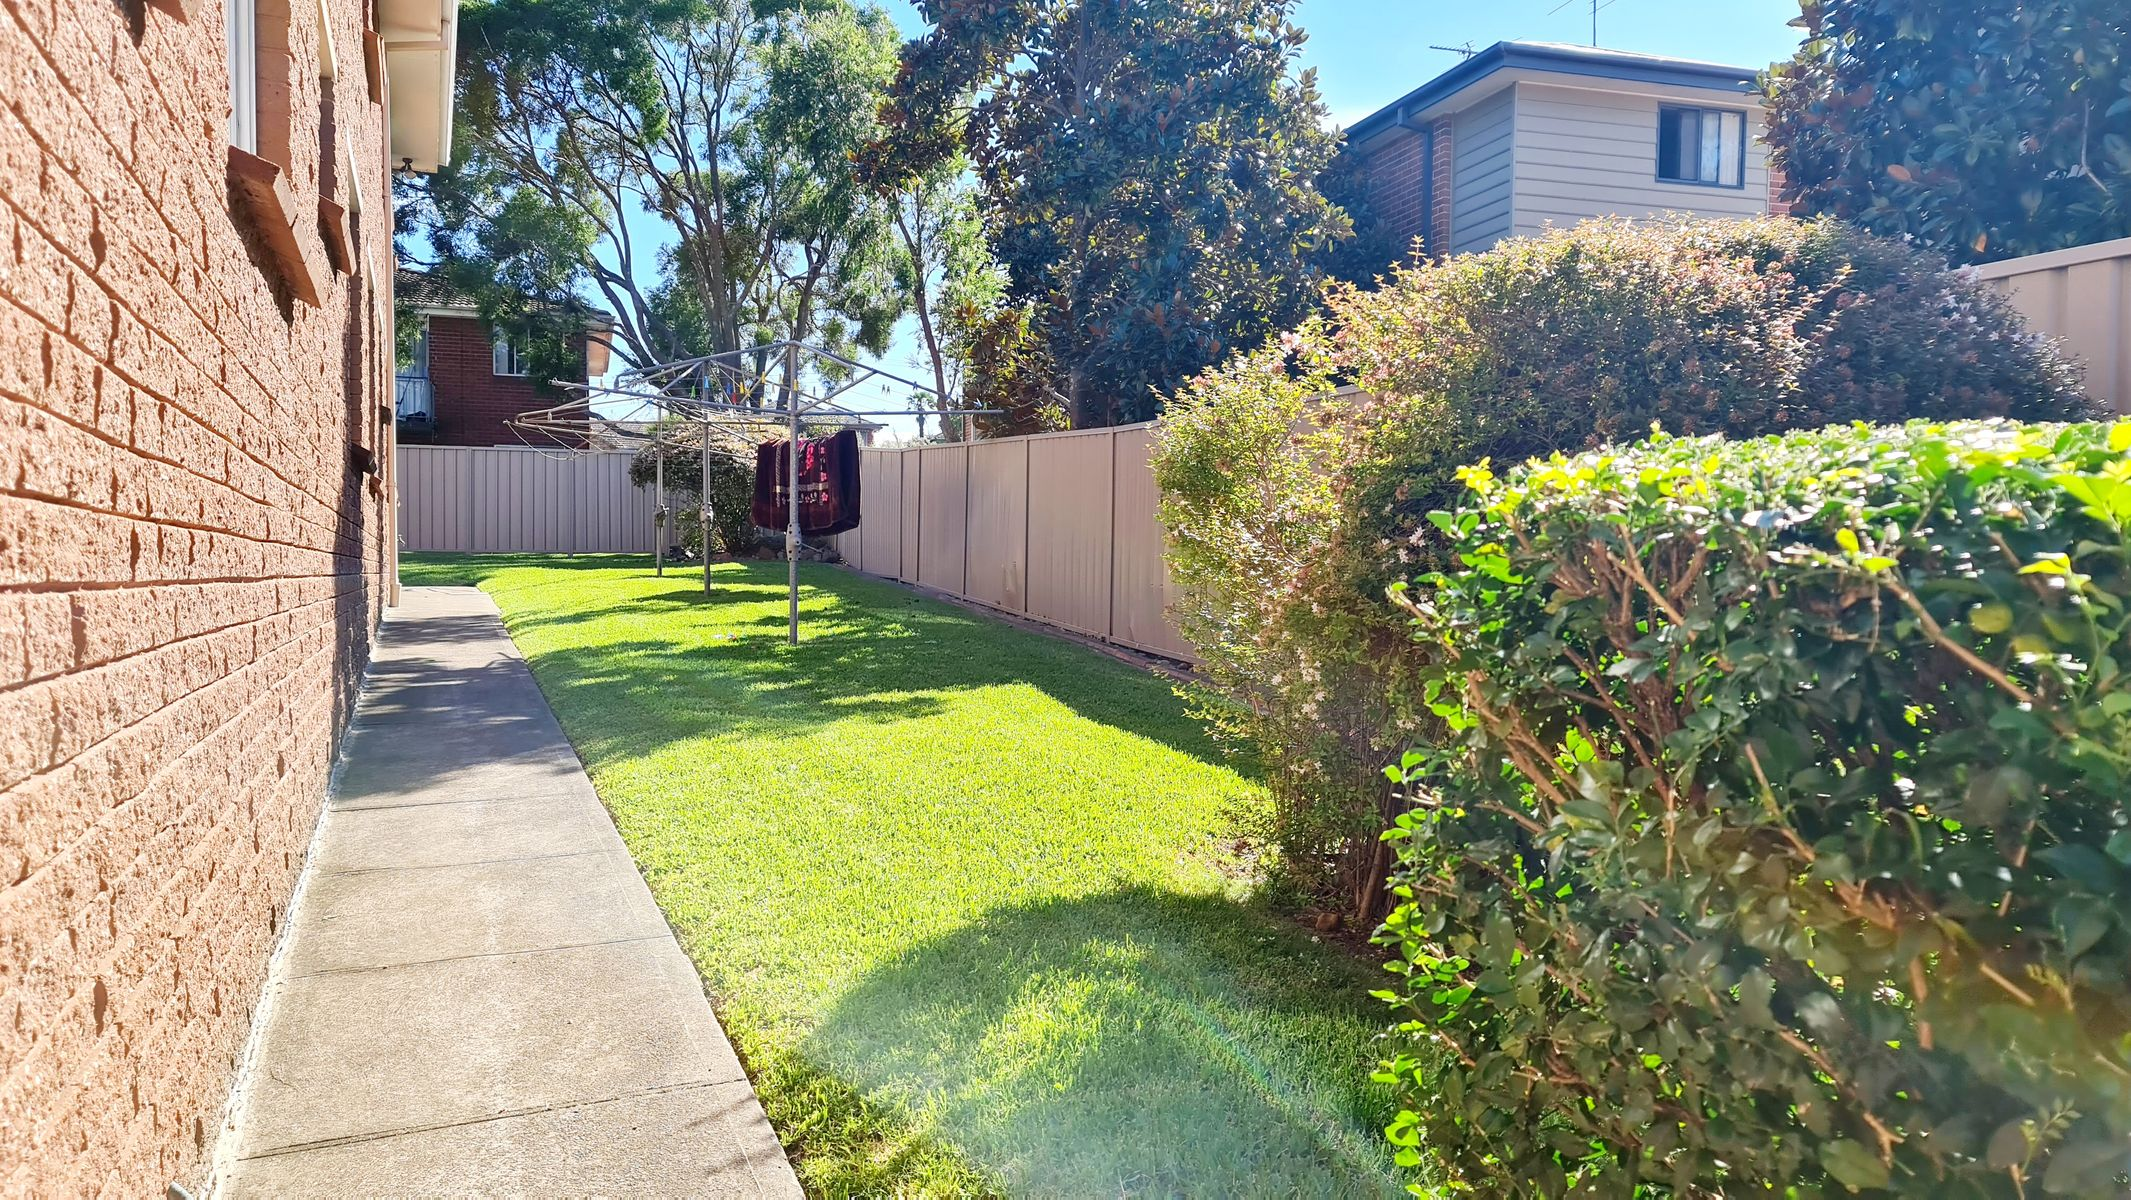 7/50 Robert Street, Jesmond, NSW 2299